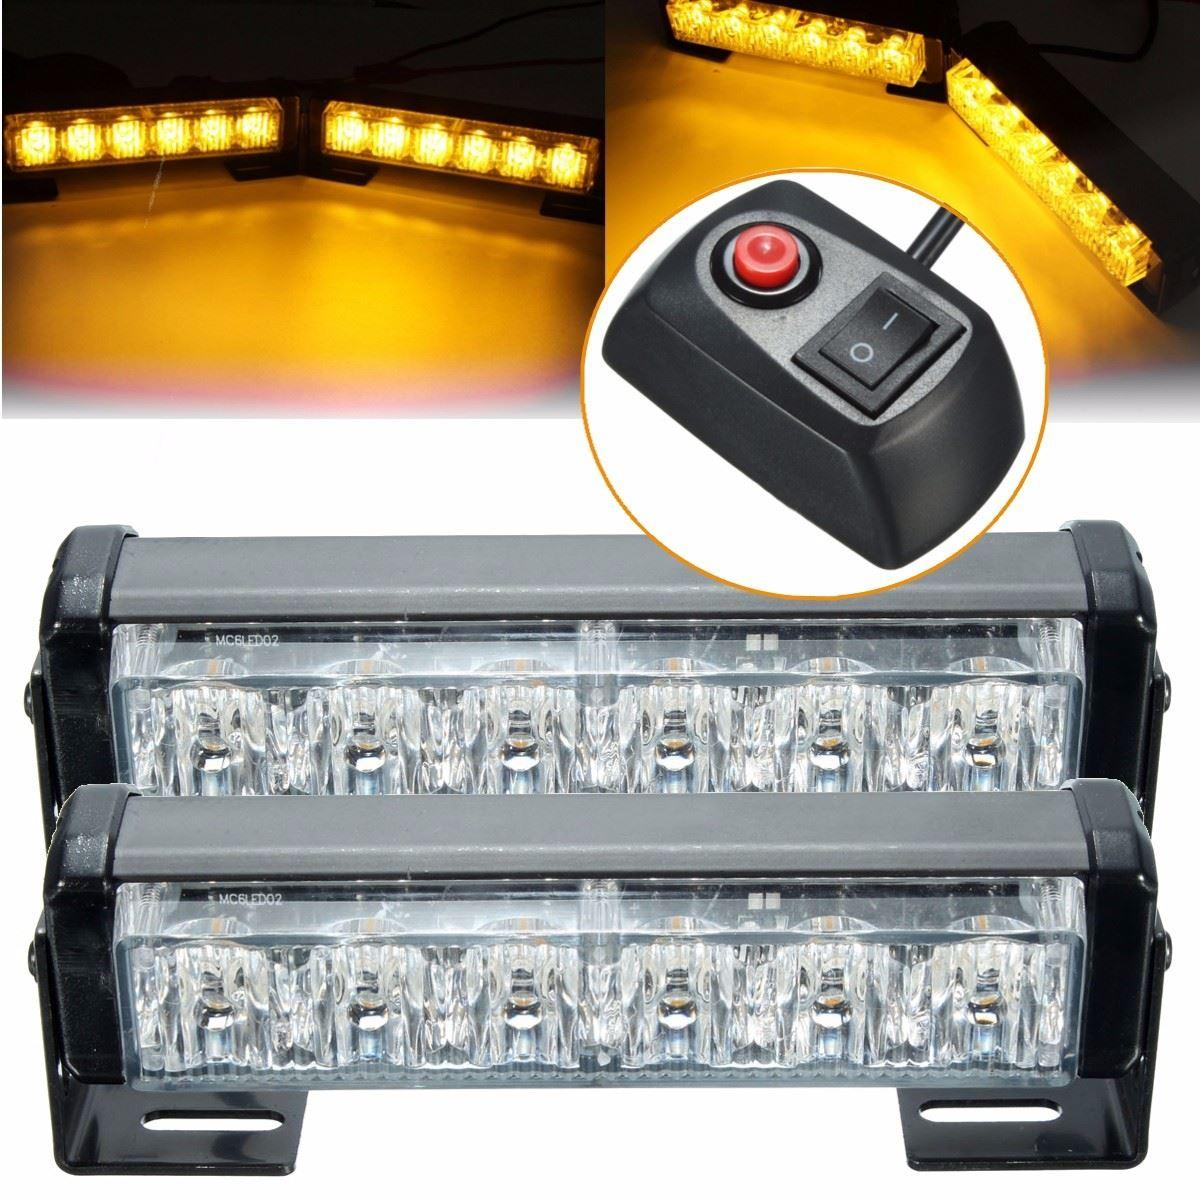 2017 new 2x 6 led 12v amber car flashing hazard light strobe flash